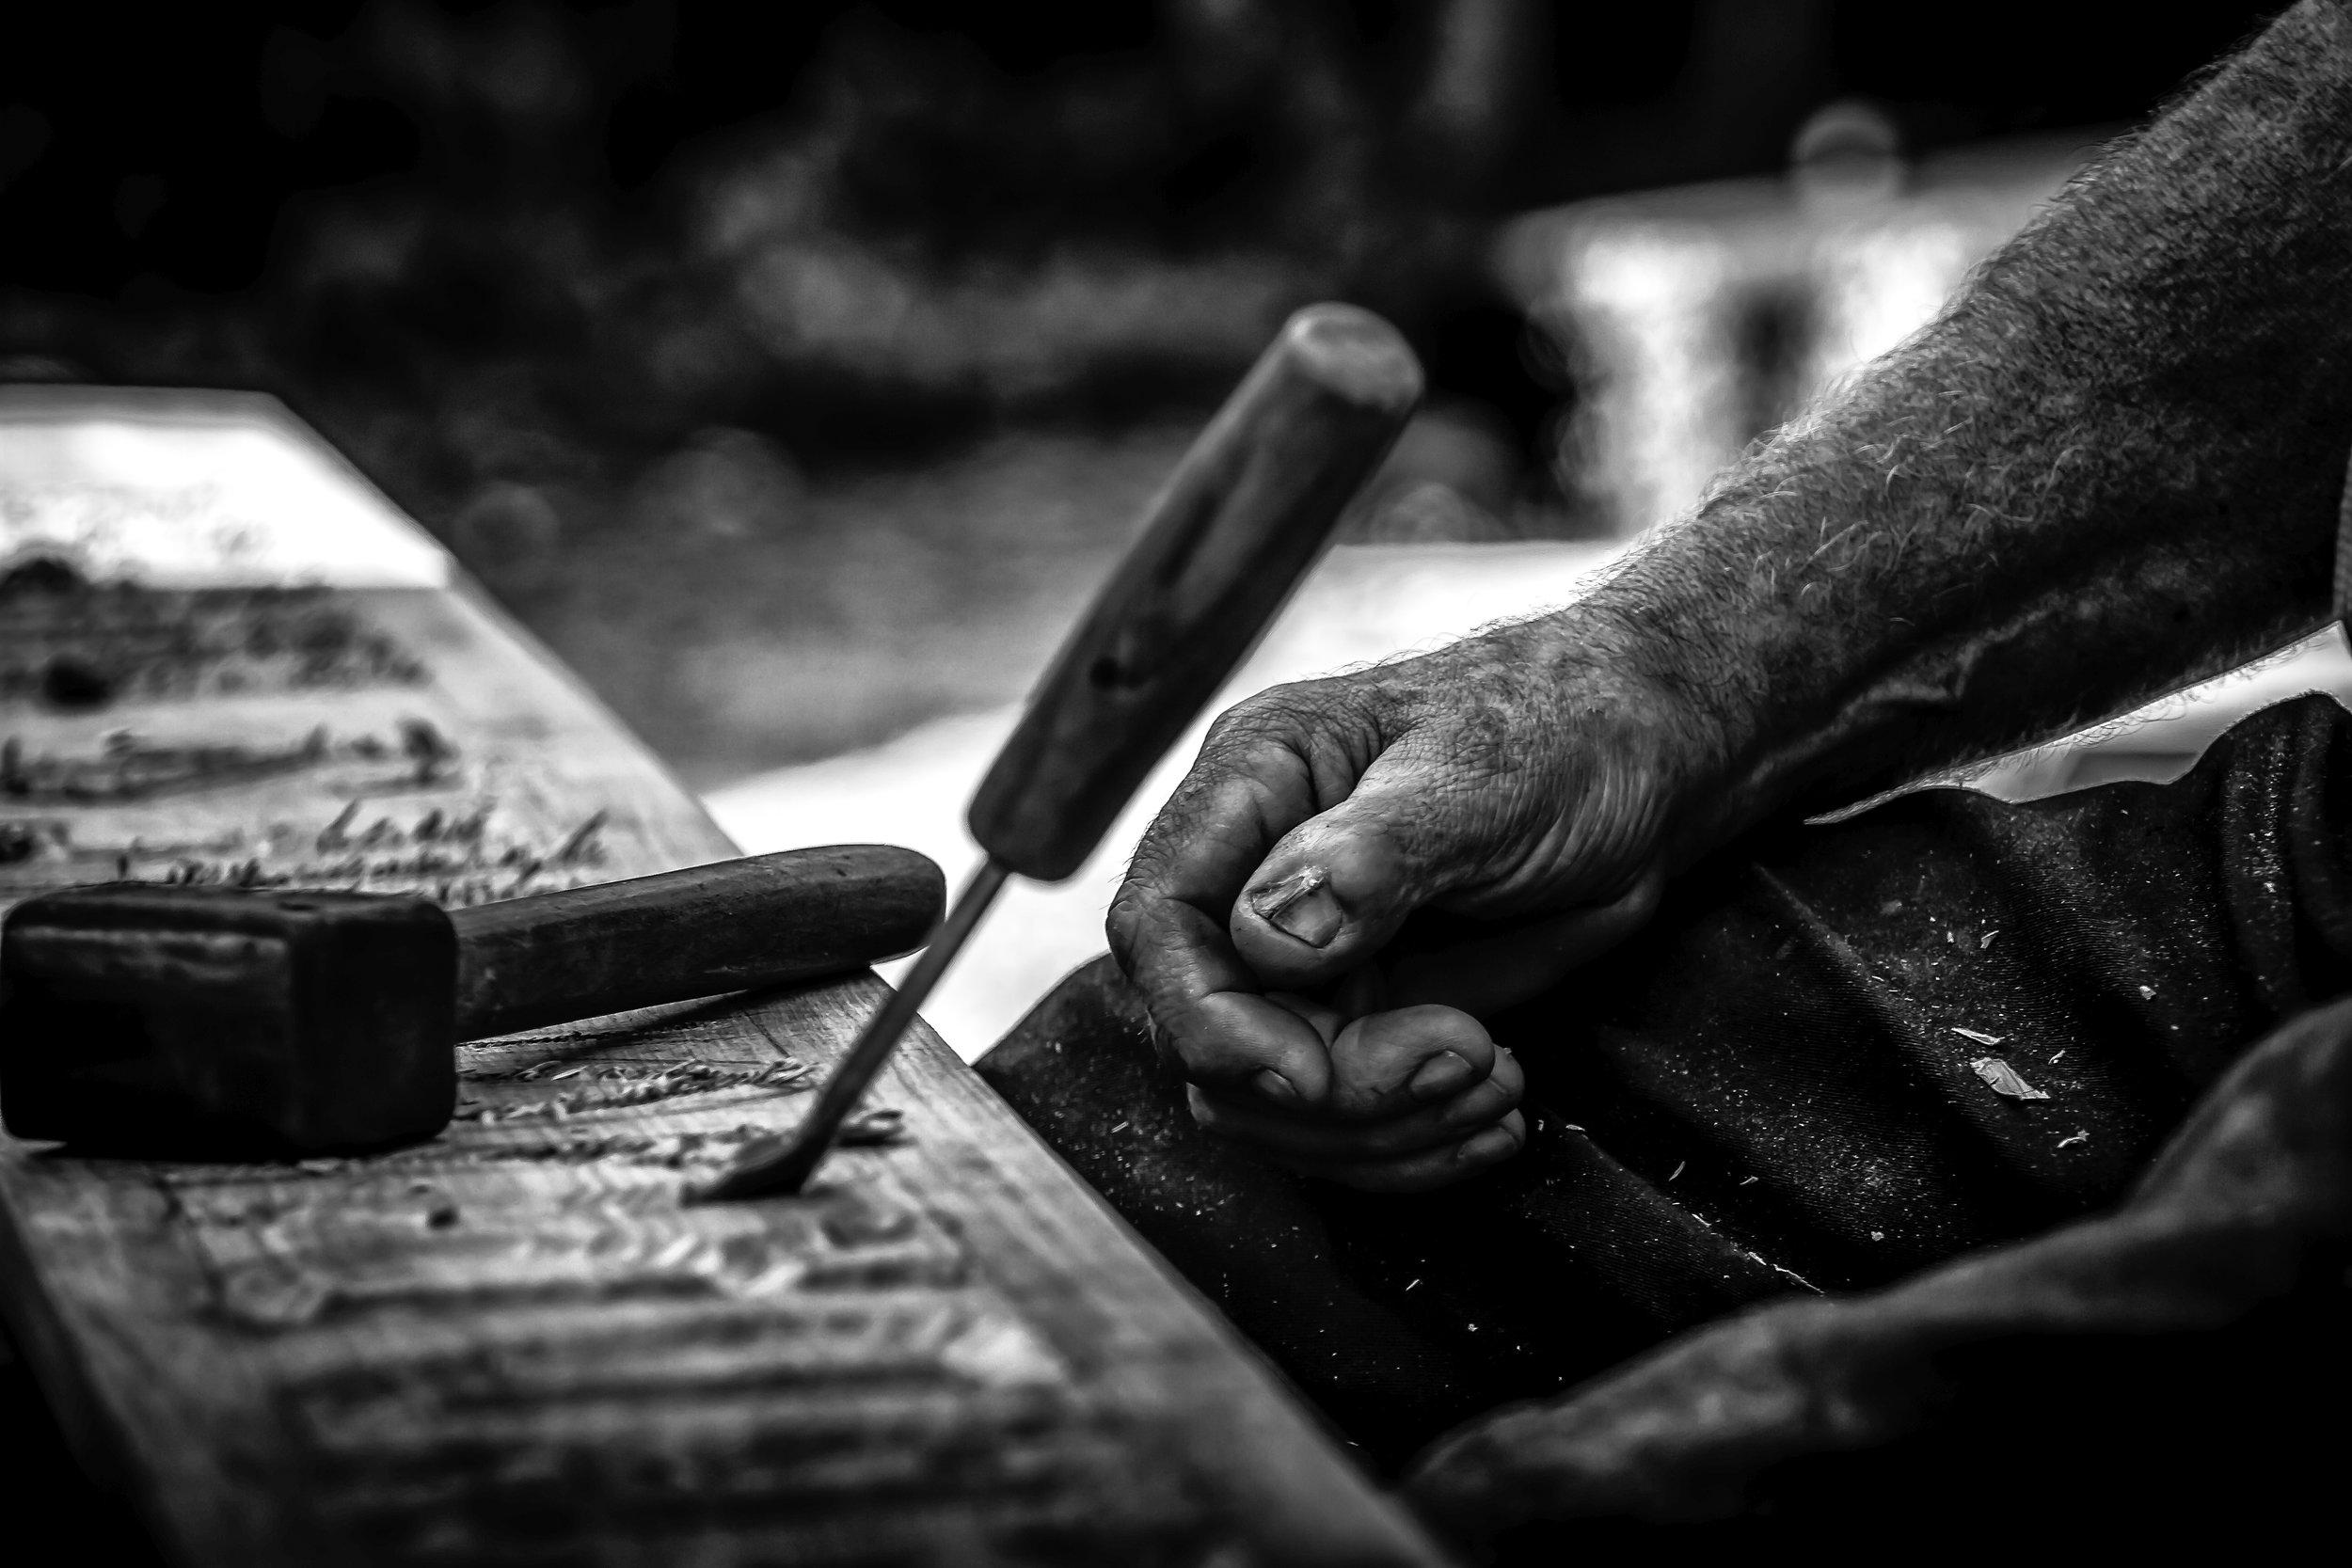 Working Tools_EdgarasVaicikevicius.jpg